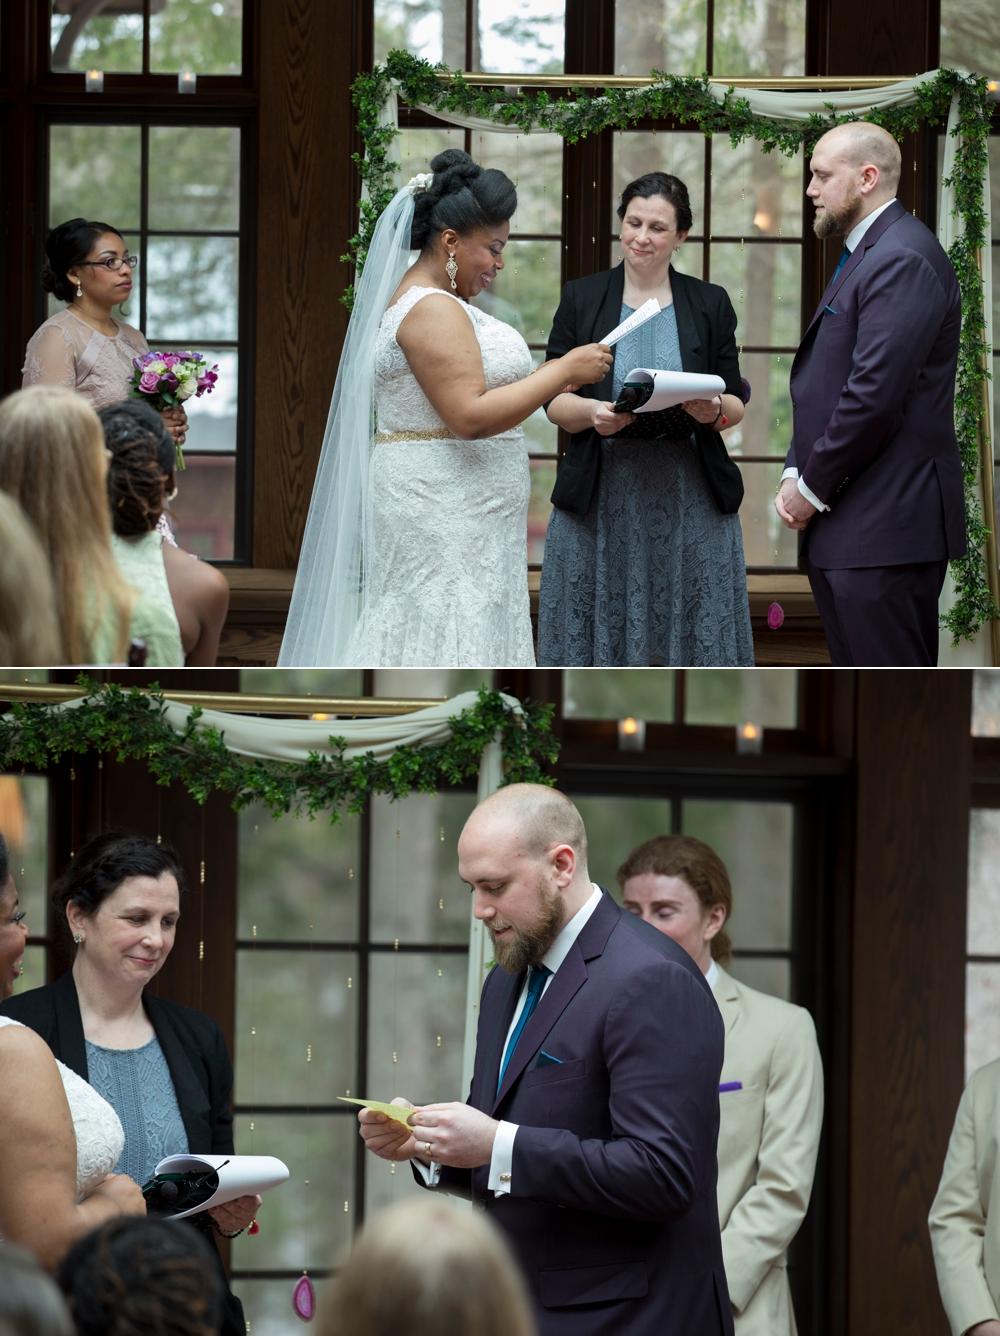 SomerbyJonesPhotography_WillowdaleWedding_Willowdale_Wedding_0028.jpg